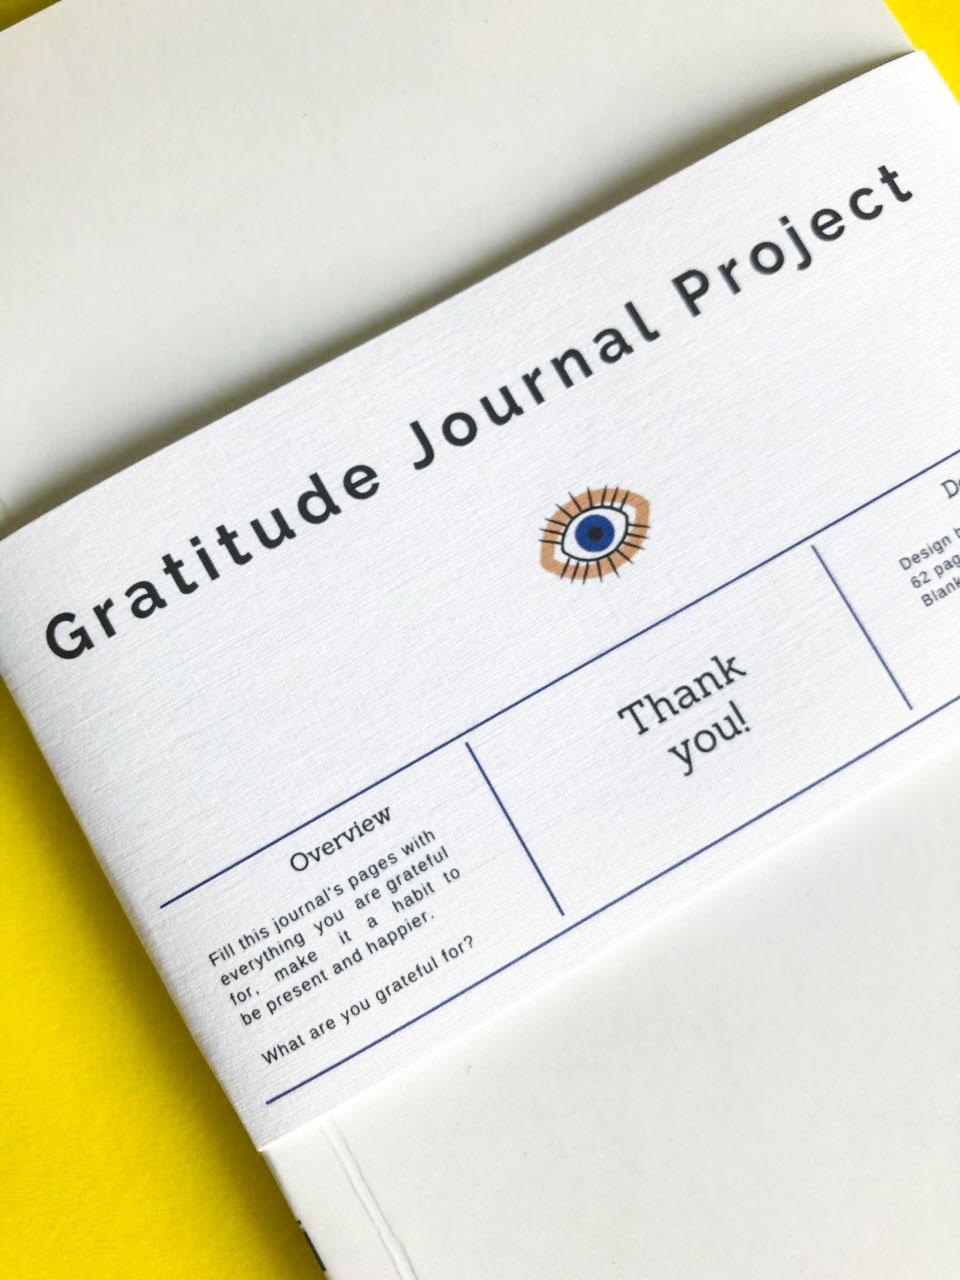 gratitudeproject5.jpeg.JPG